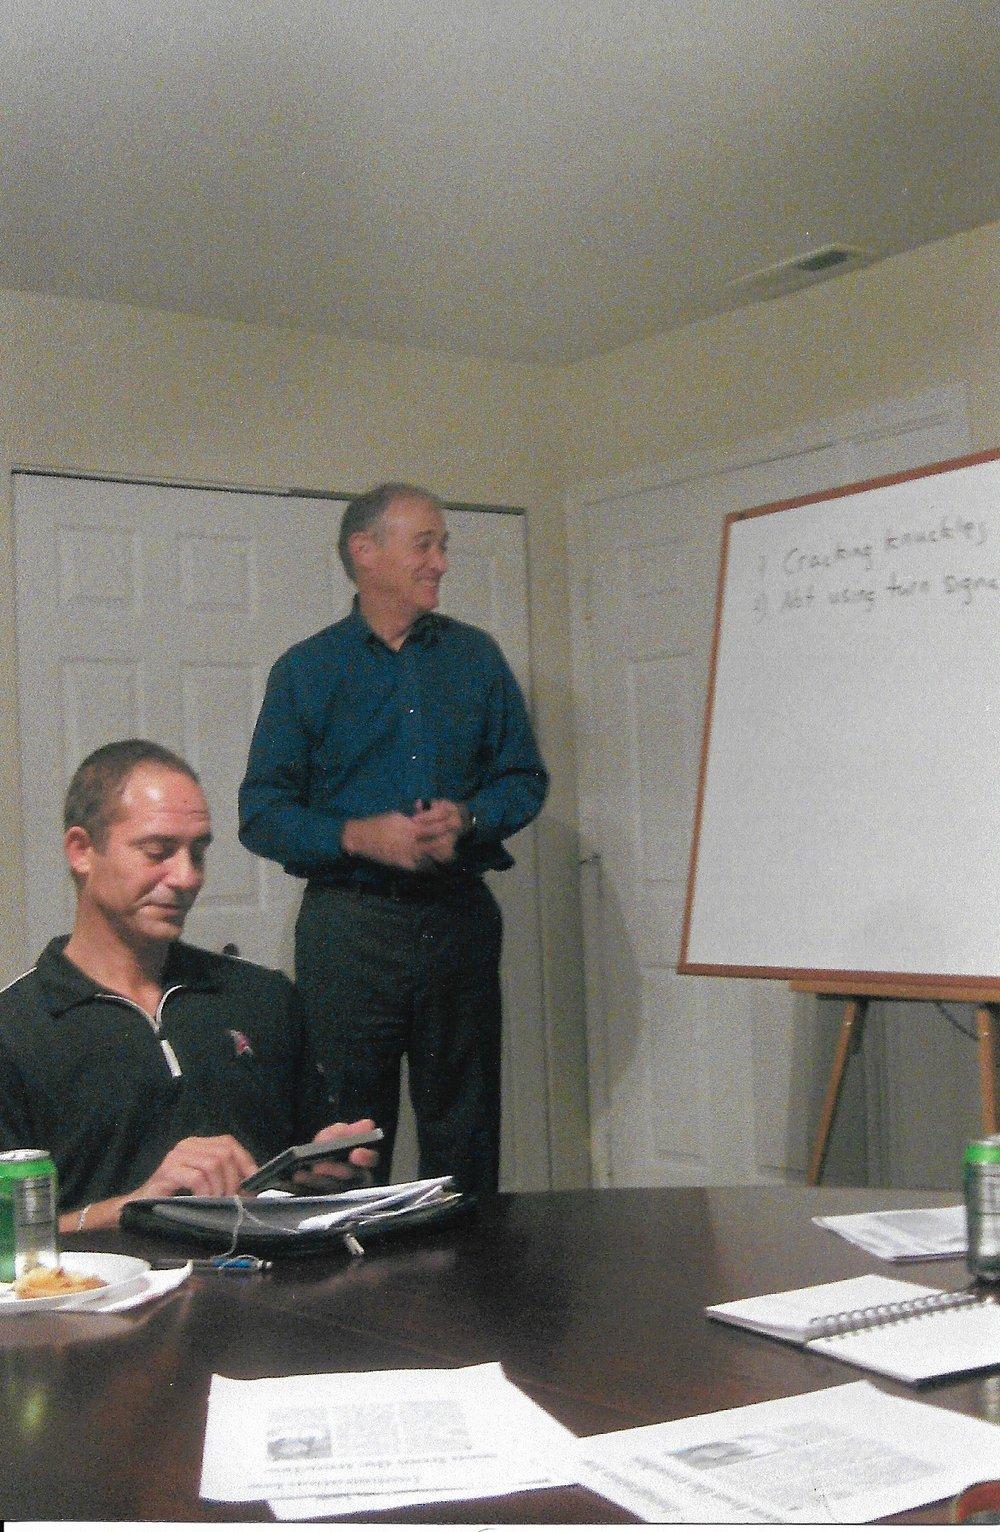 Sturgis teaching circa 2000